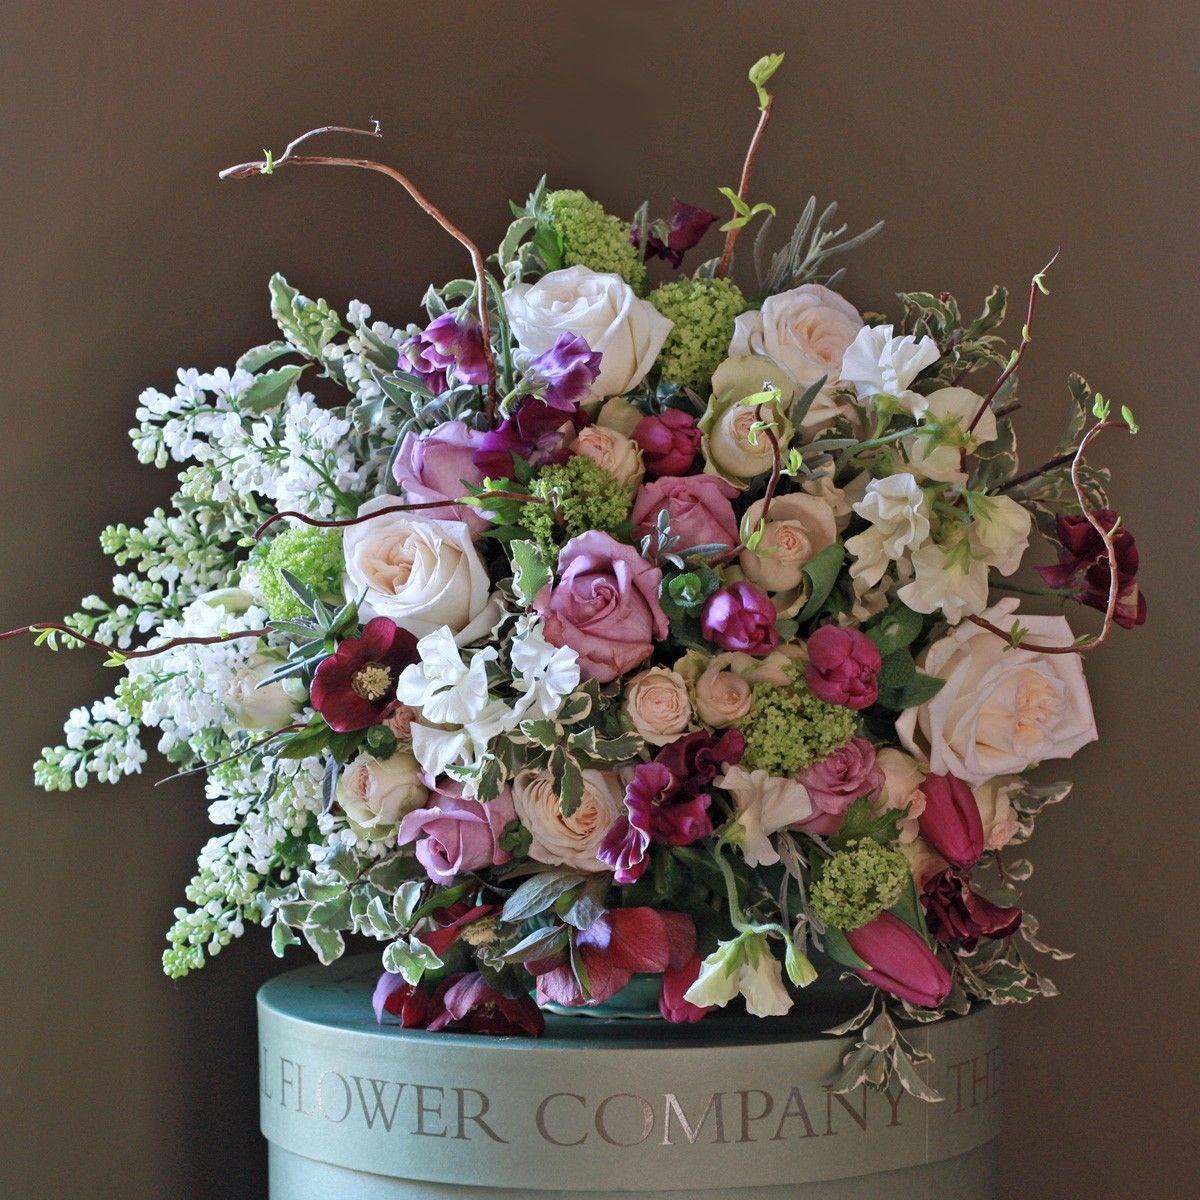 Spring Flower Bouquet | Stock Flower Images | Pinterest | Spring ...